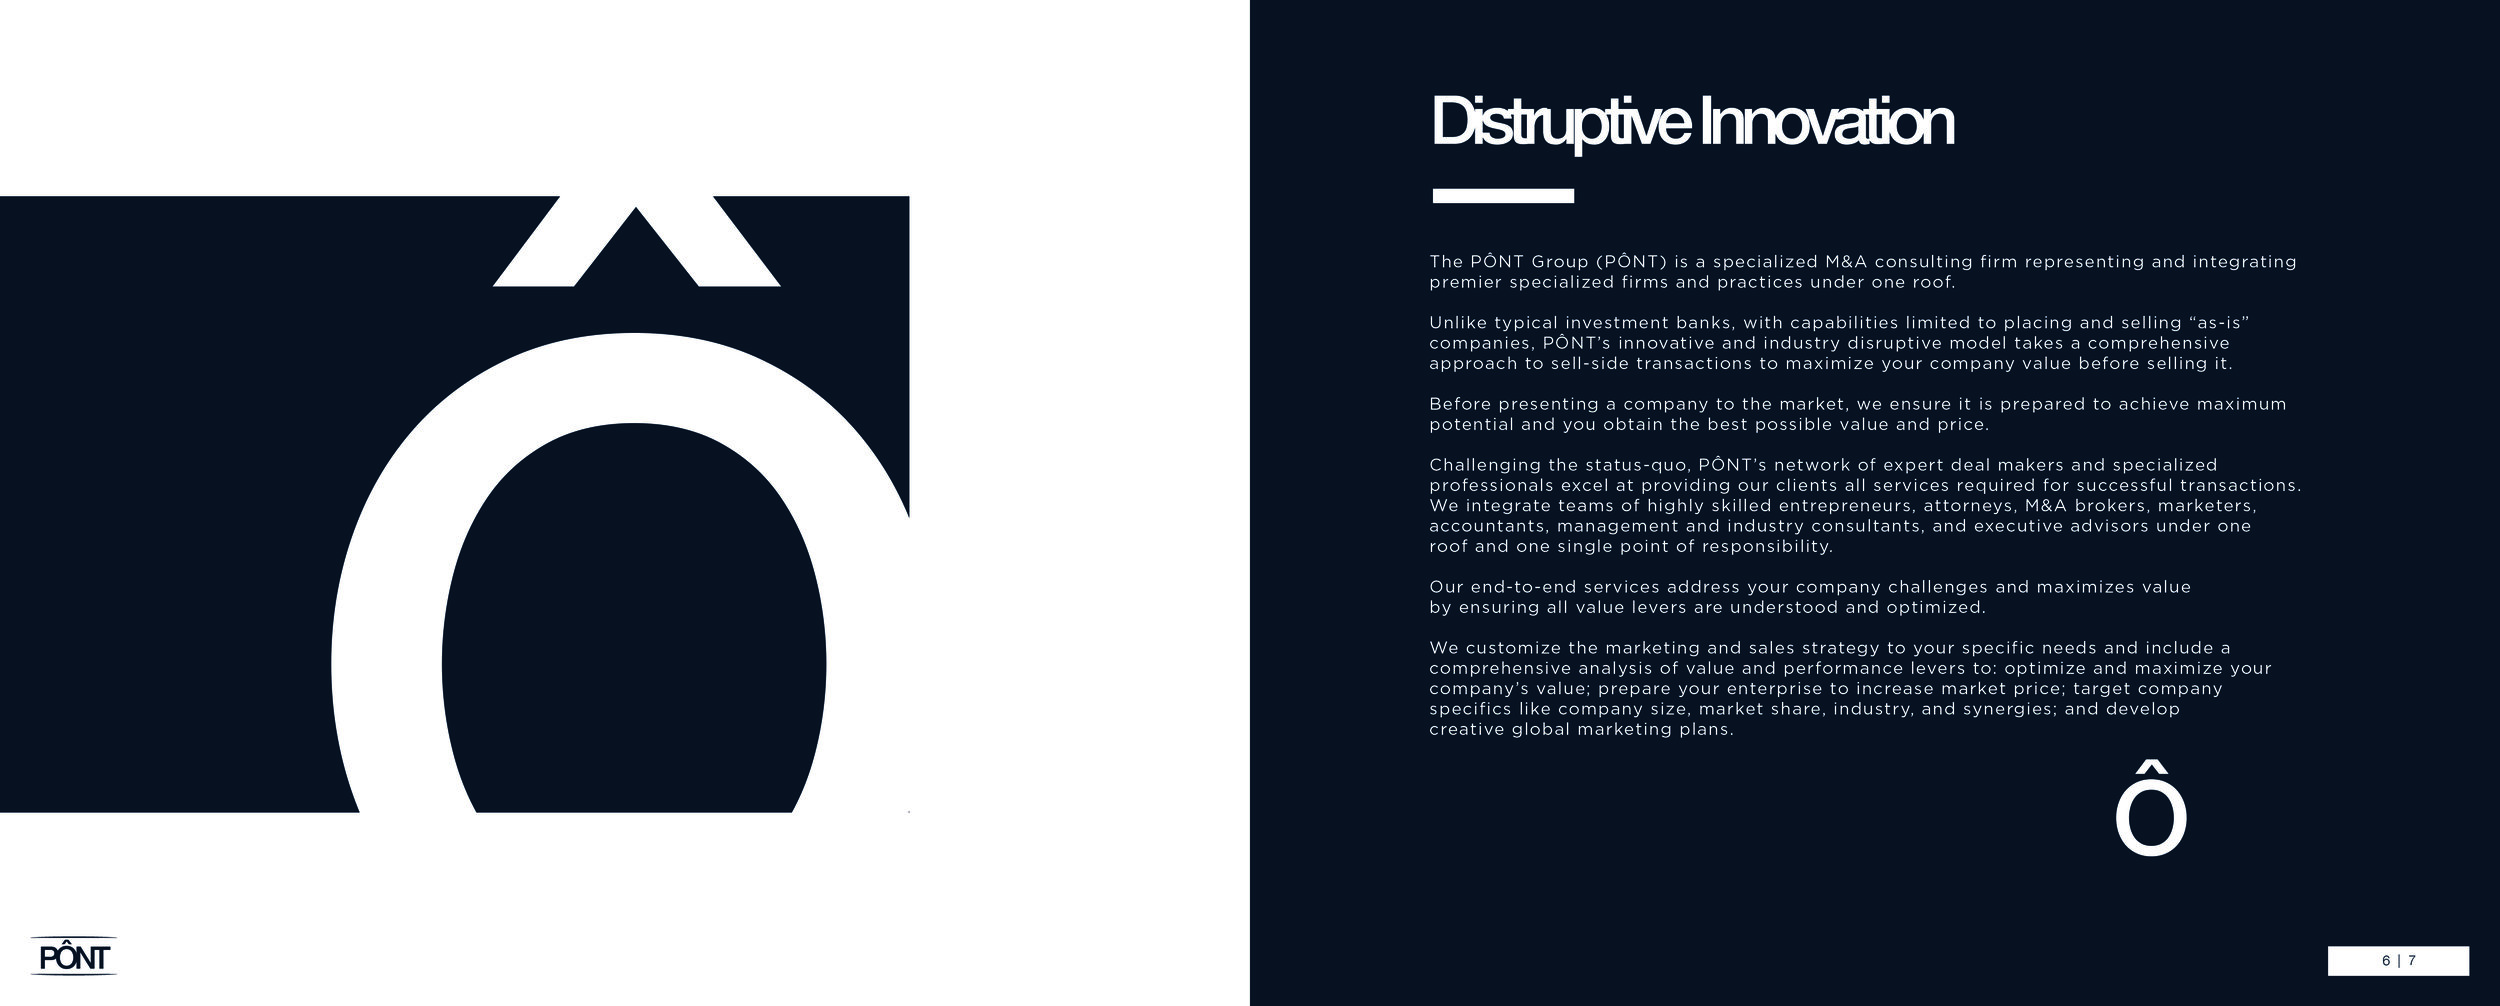 PONT BOOK 10x8 Disruptive.jpg